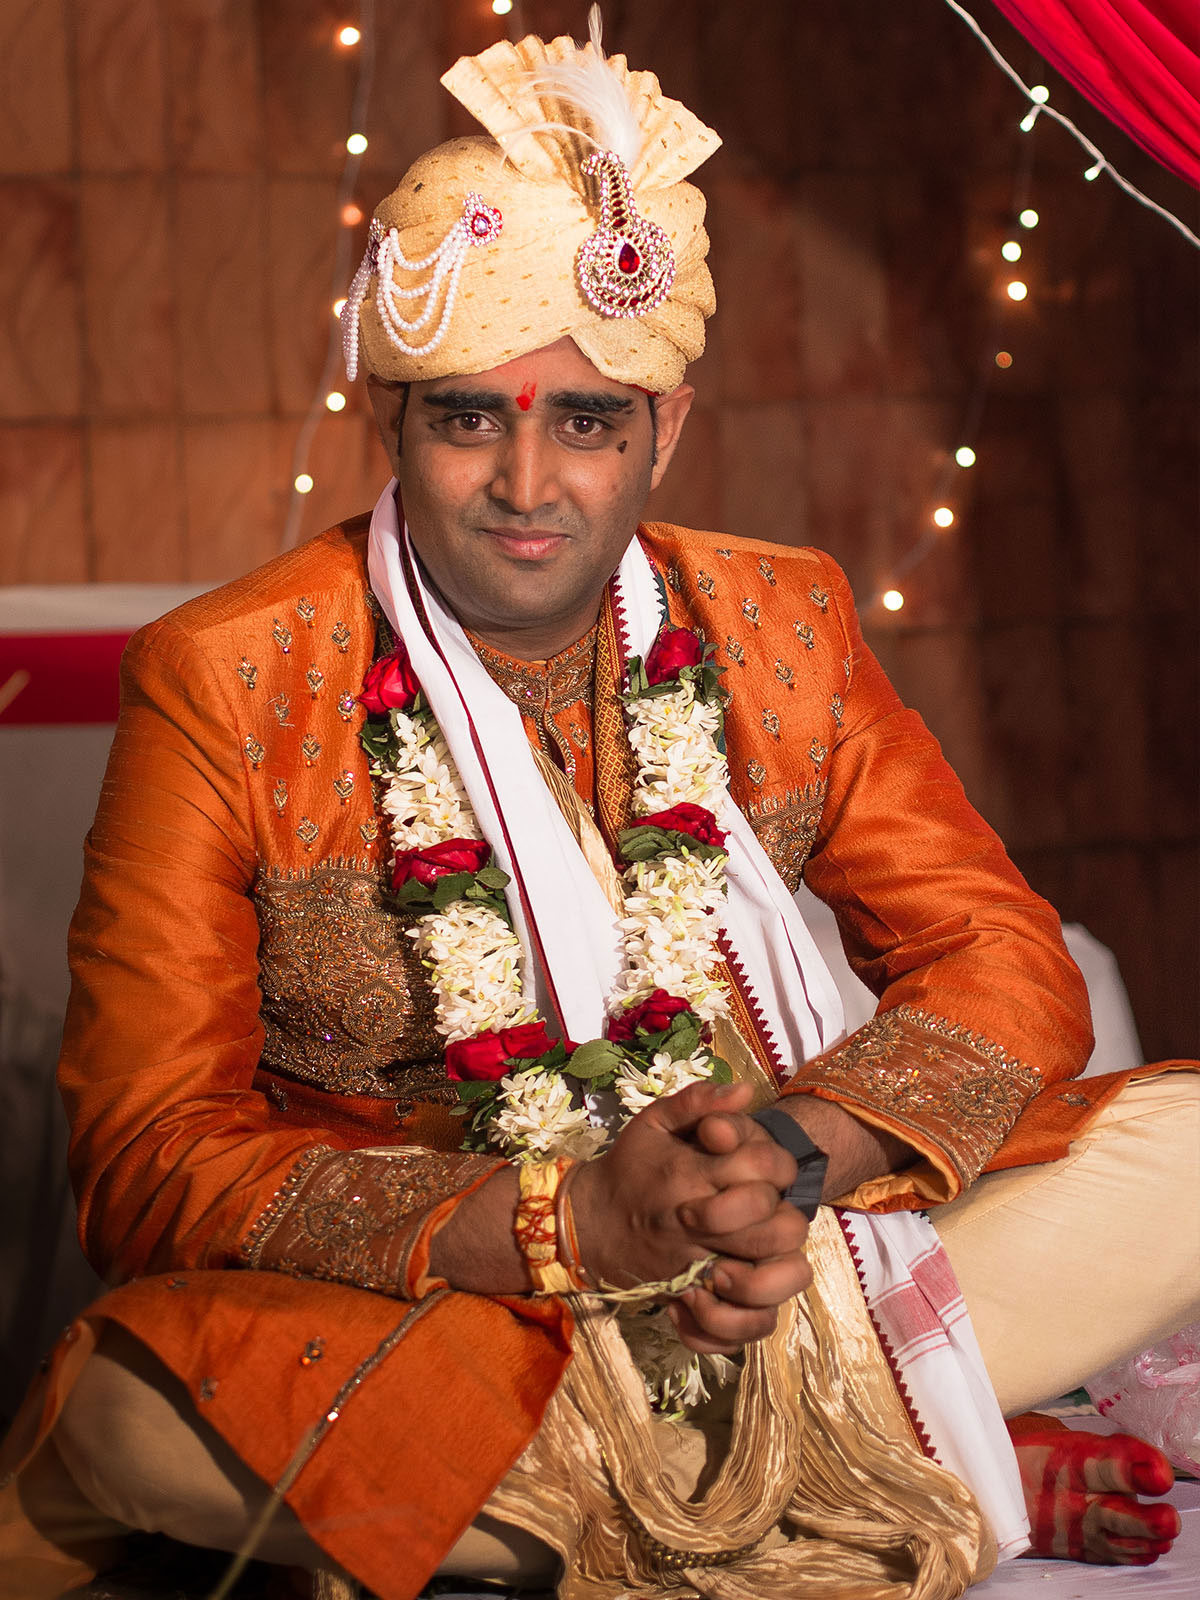 india_wedding_bridegroom